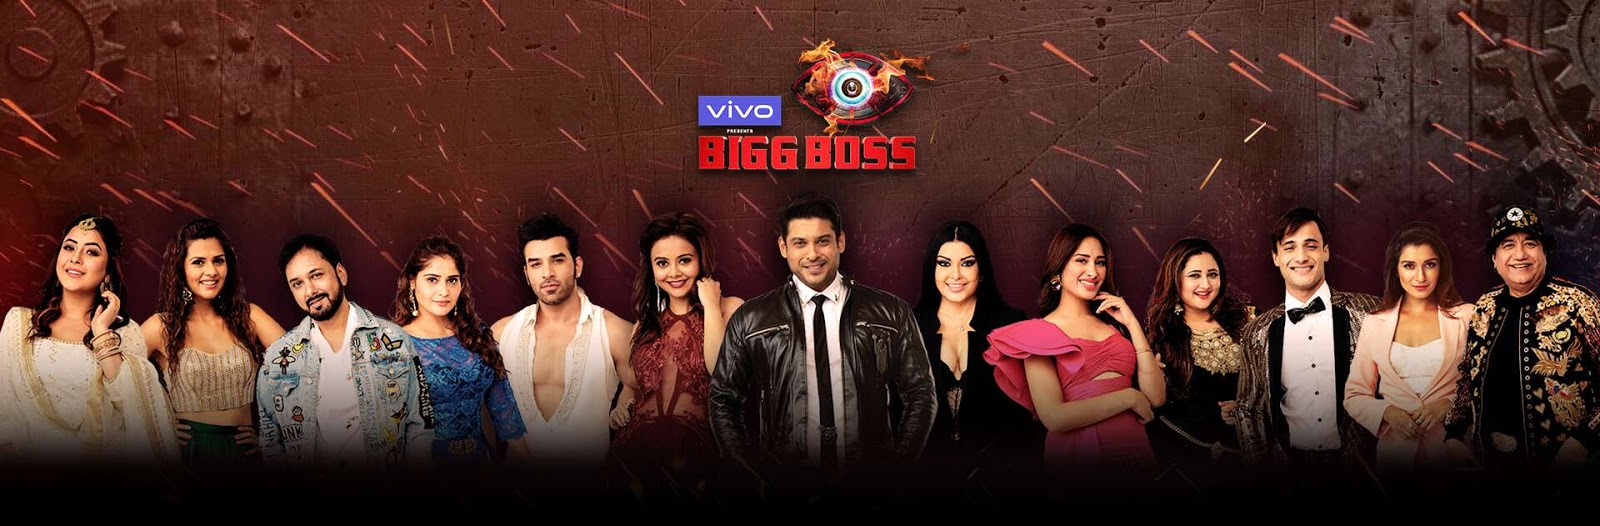 Bigg Boss Season 1 2 3 4 5 6 7 8 9 10 11 12 13 14 Winners Name With Photos If you want to know bigg boss winners of every season. bigg boss season 1 2 3 4 5 6 7 8 9 10